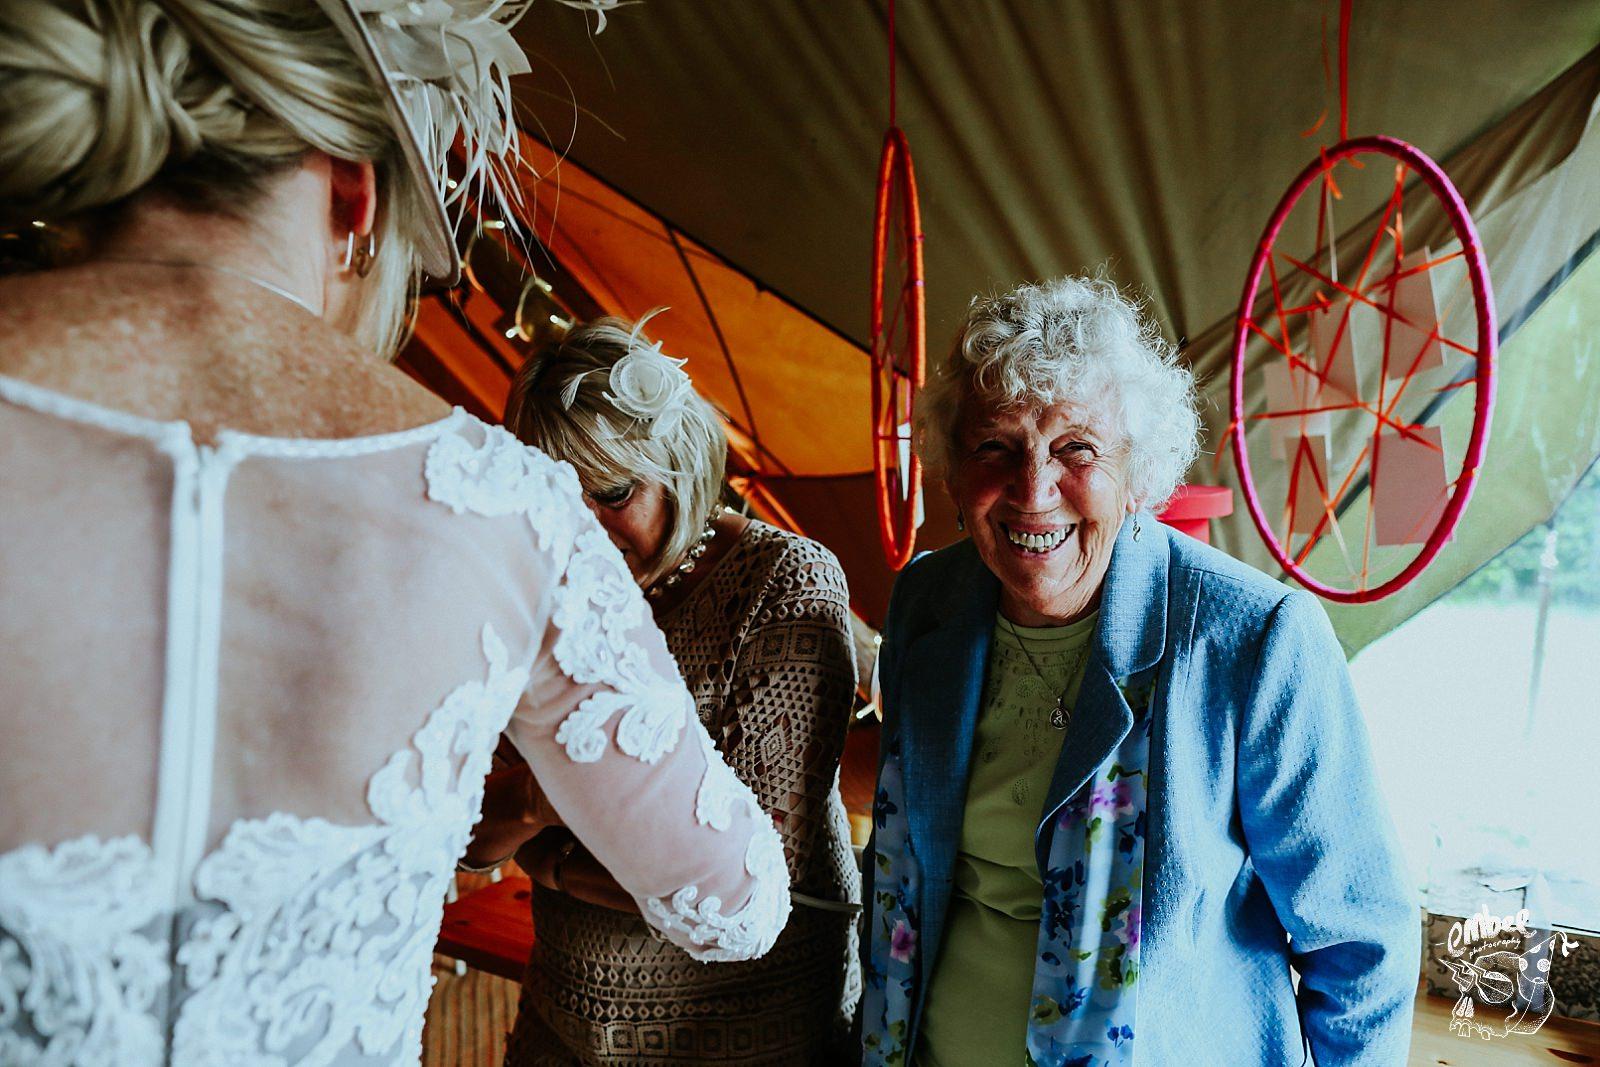 smiling granma at the camera